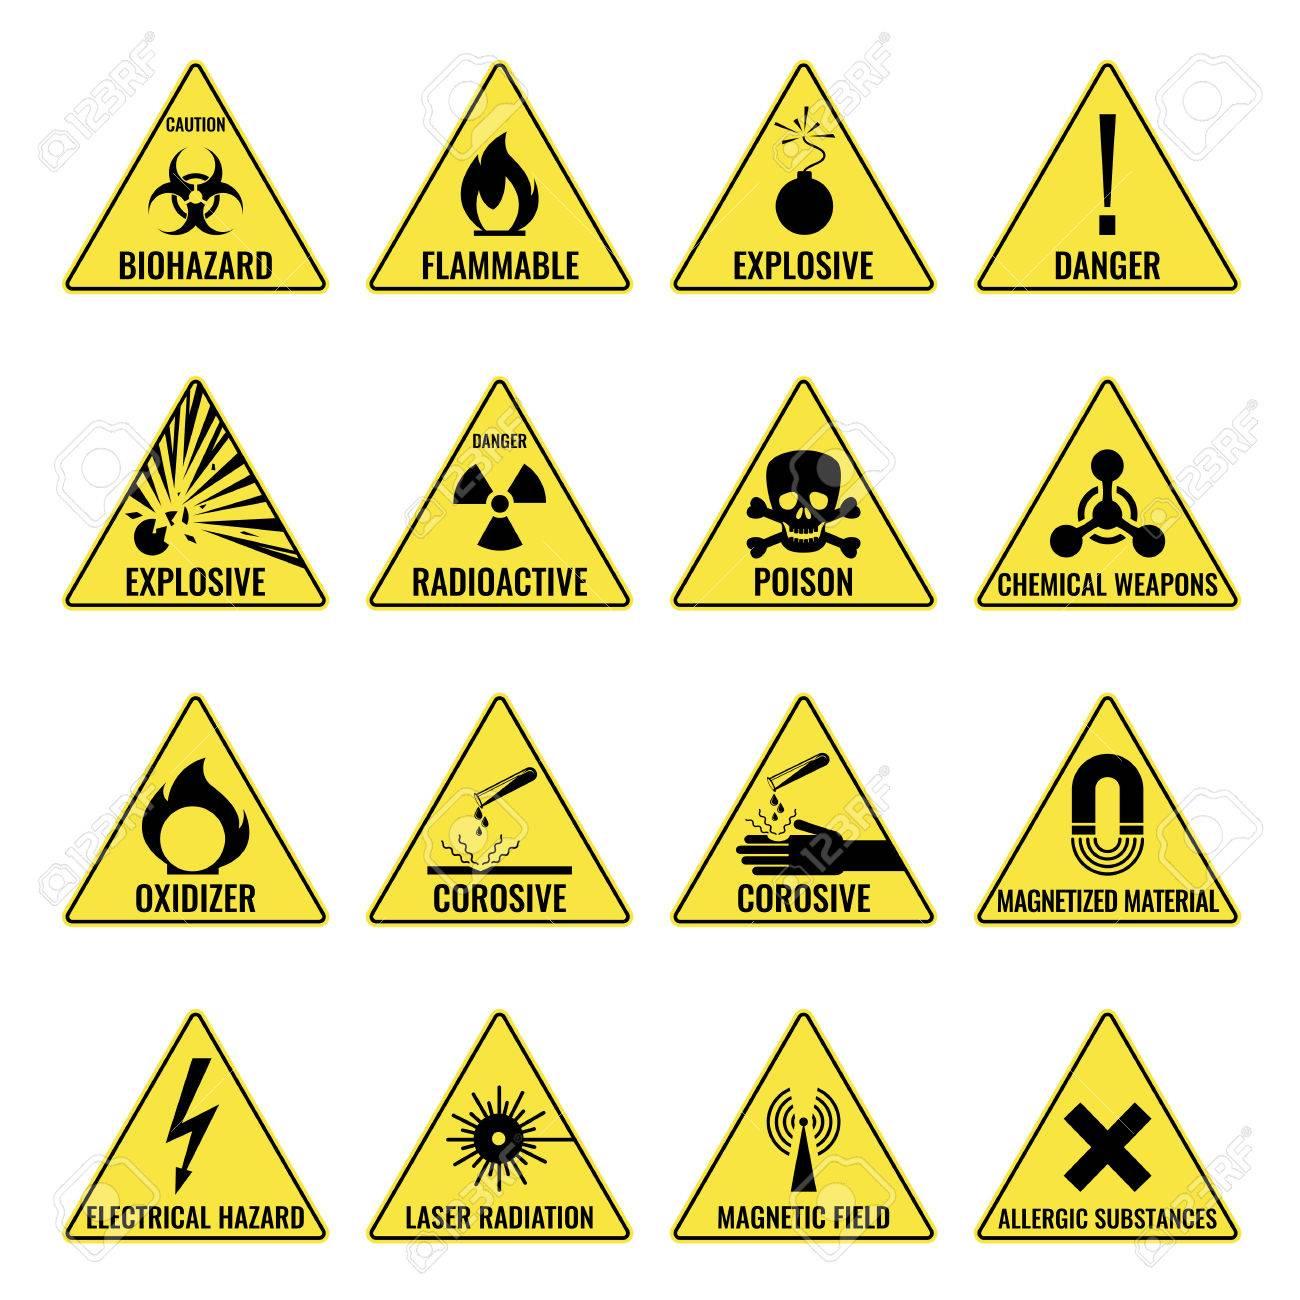 Hazard warning triangual yellow icon set on white - 77481893